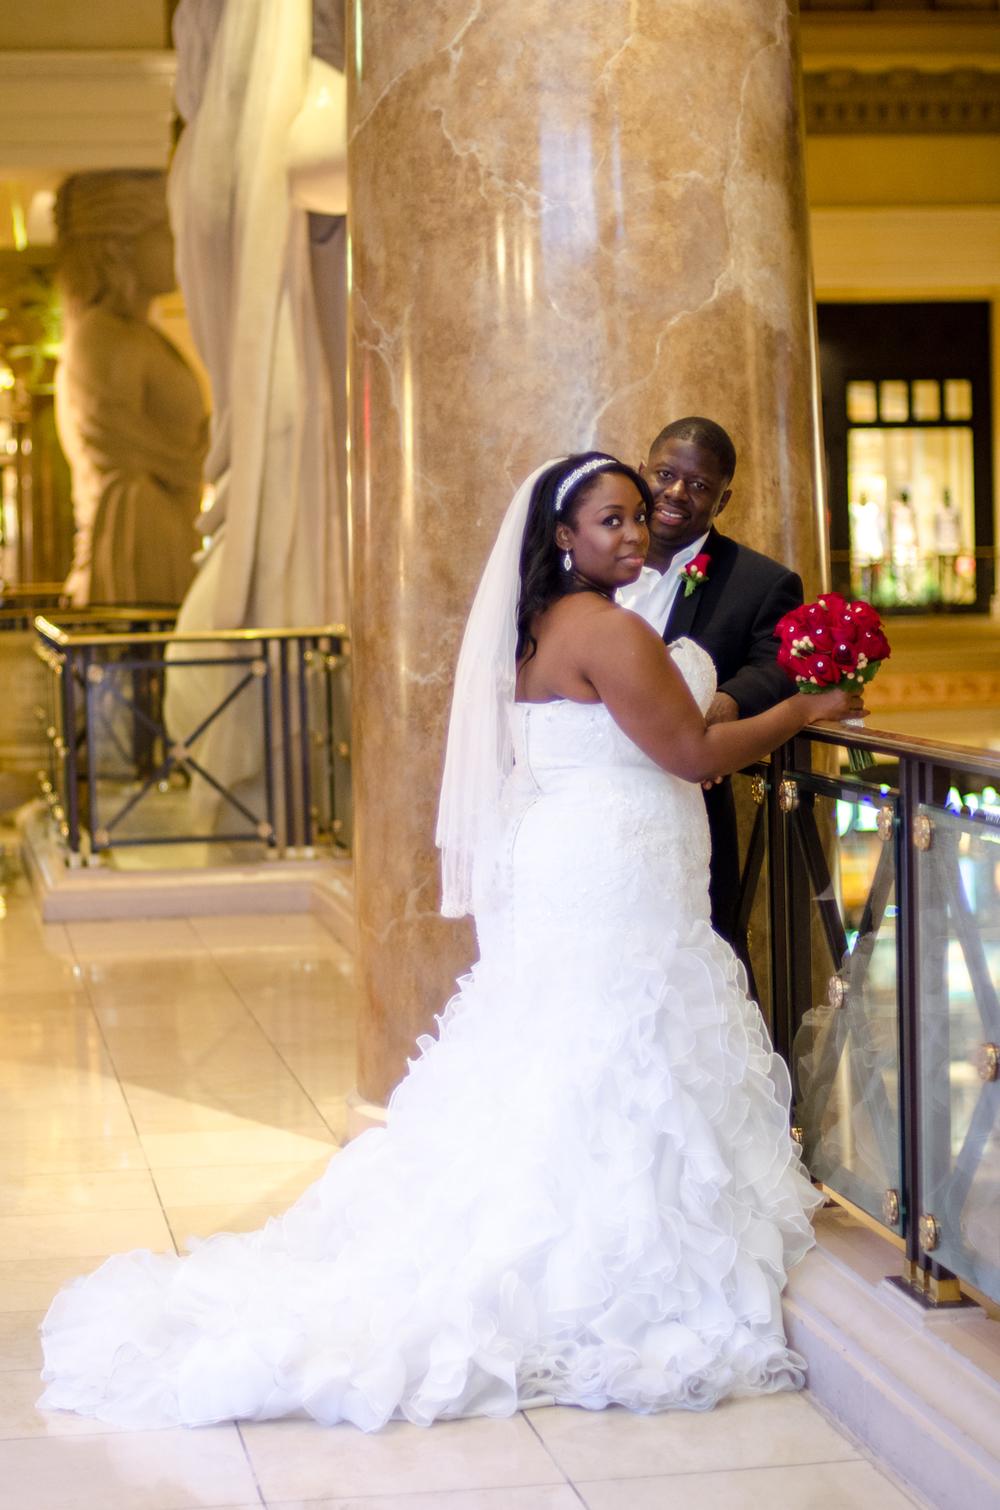 Las Vegas, Nevada Destination Wedding LeAnthony and Markheia